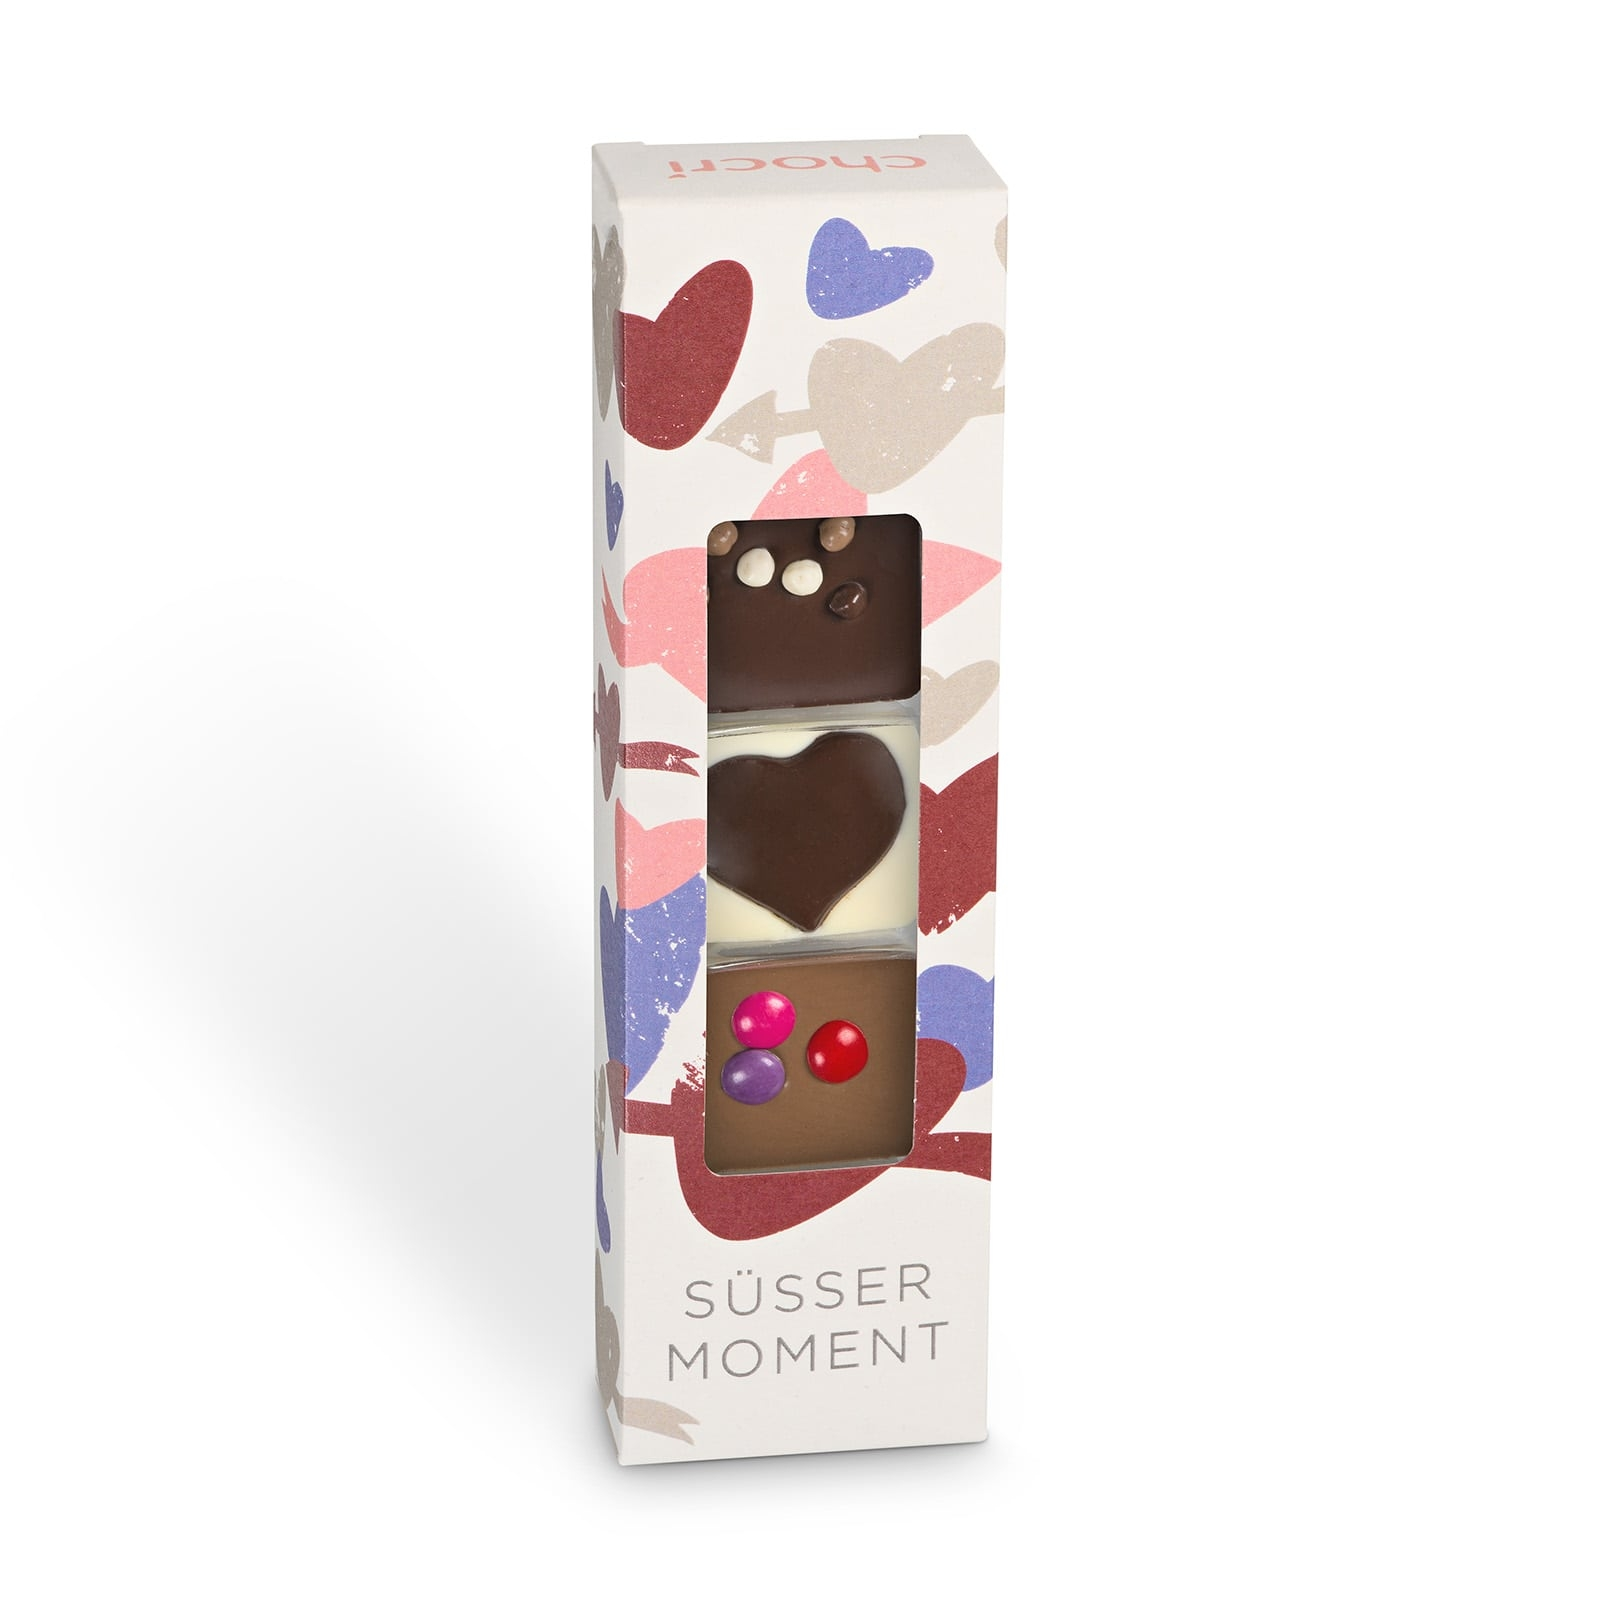 Köstlichsüsses - chocri 'Süßer Moment' Mini Schokoladentafeln - Onlineshop Chocri